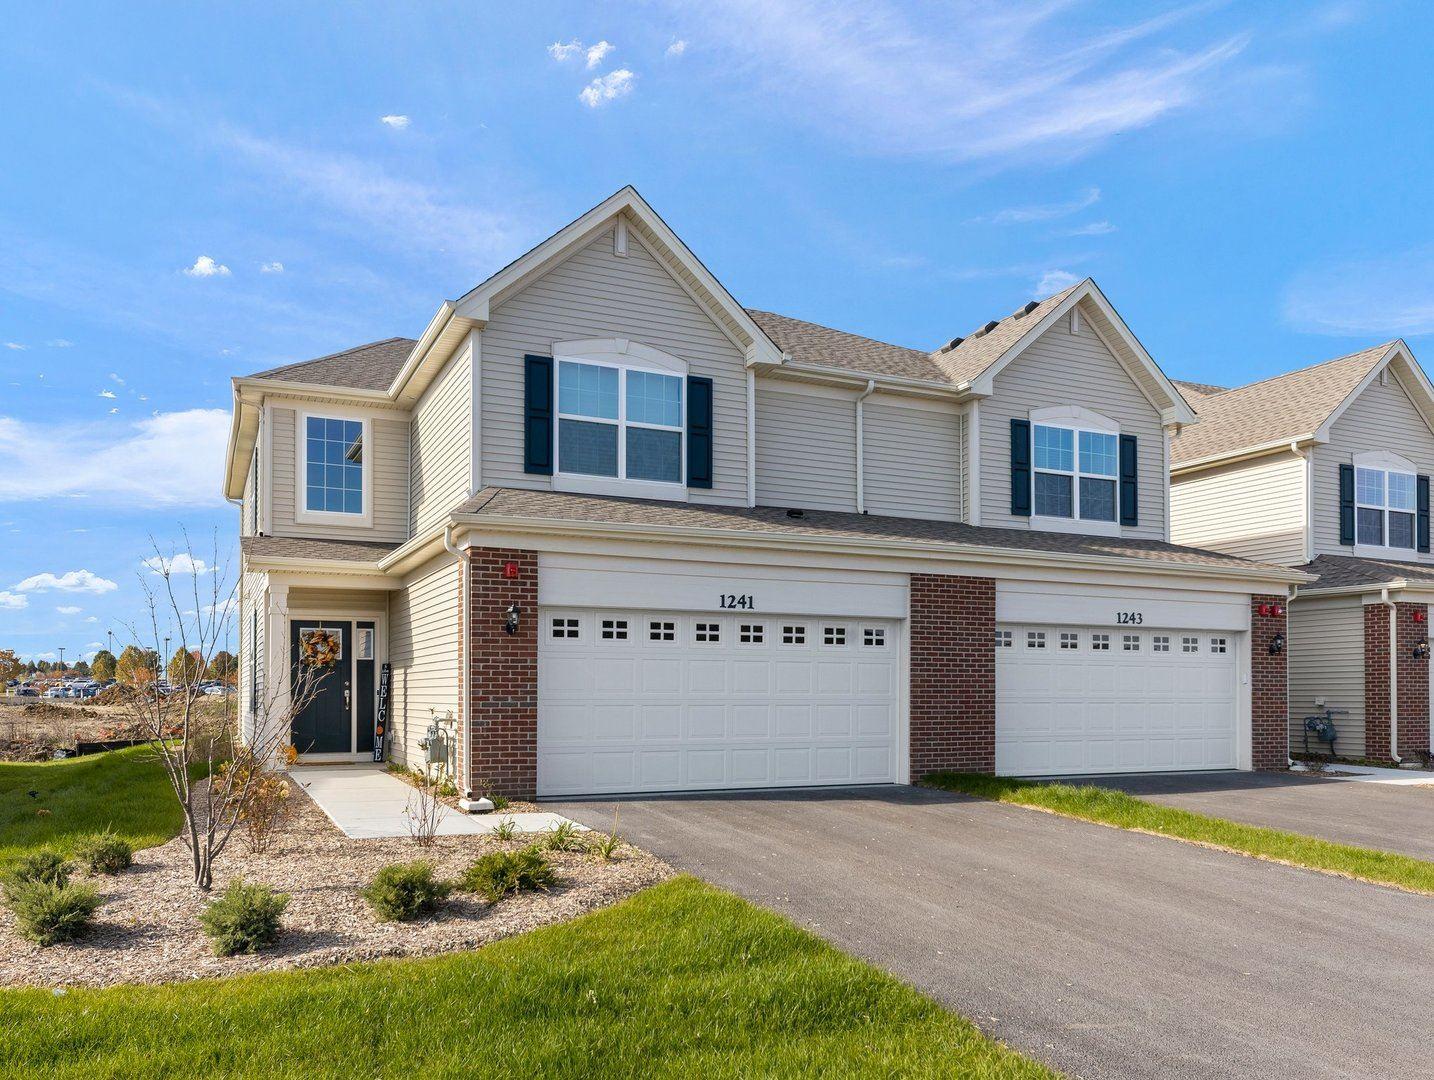 1159 Hawk Hollow Drive, Yorkville, IL 60560 - #: 11240363